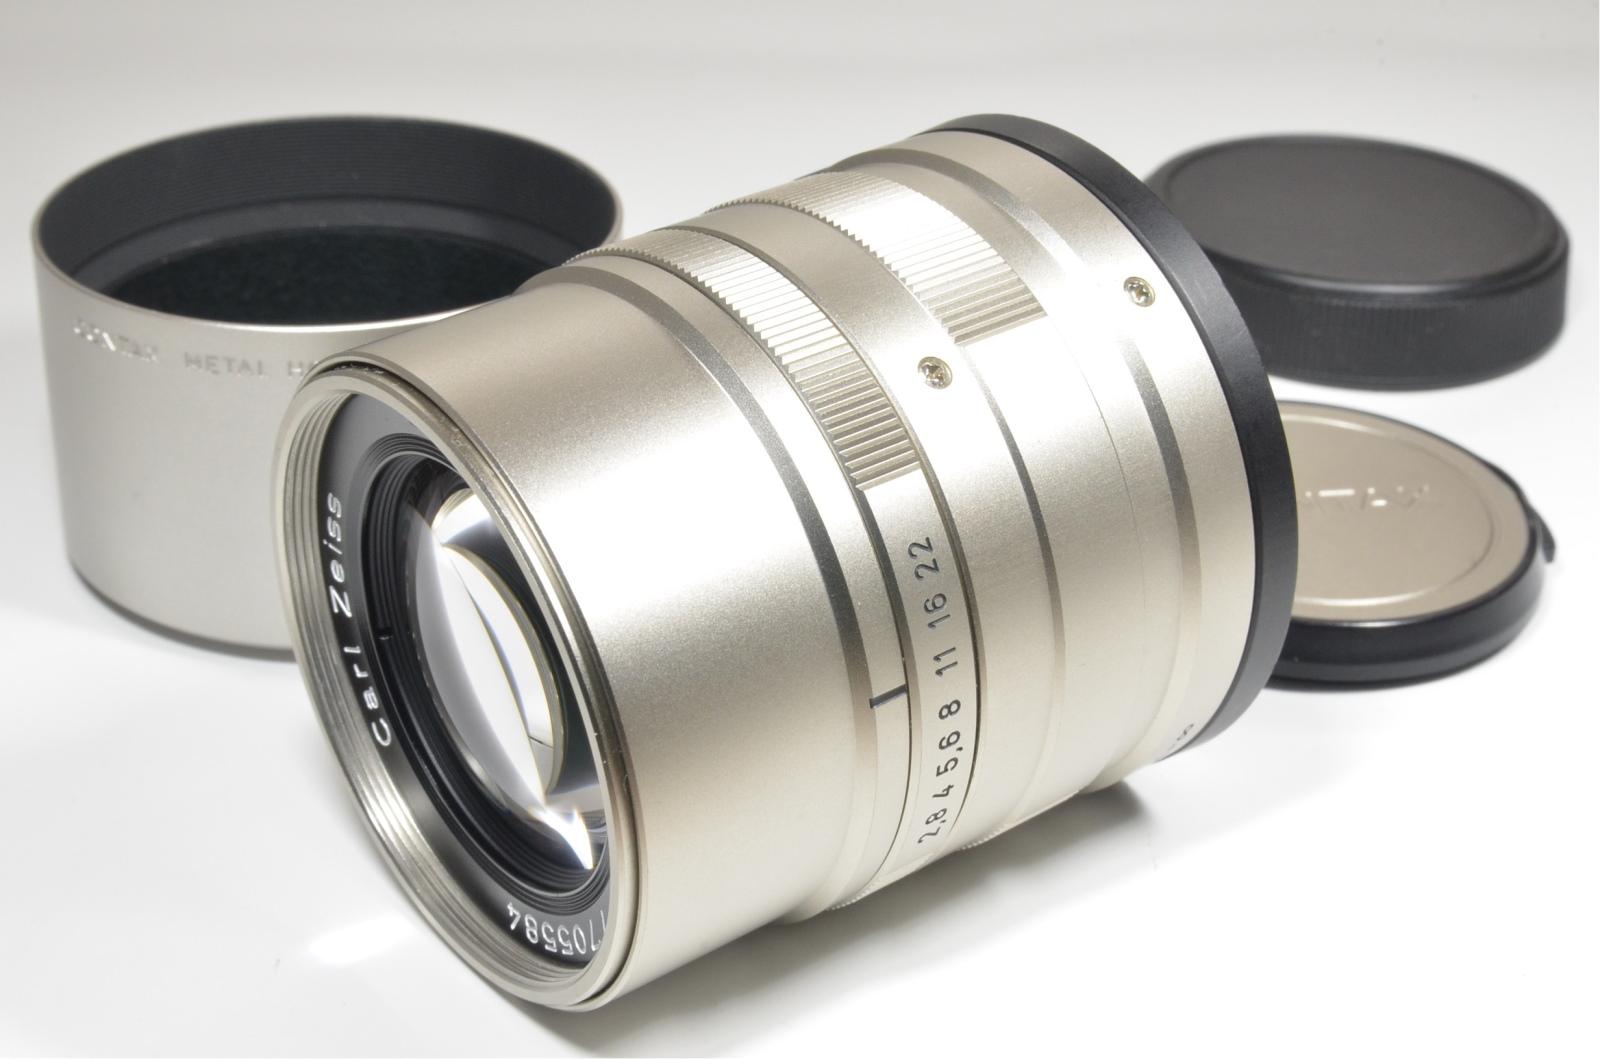 contax g2, planar 45mm f2, biogon 28mm f2.8, sonnar 90mm f2.8, tla200